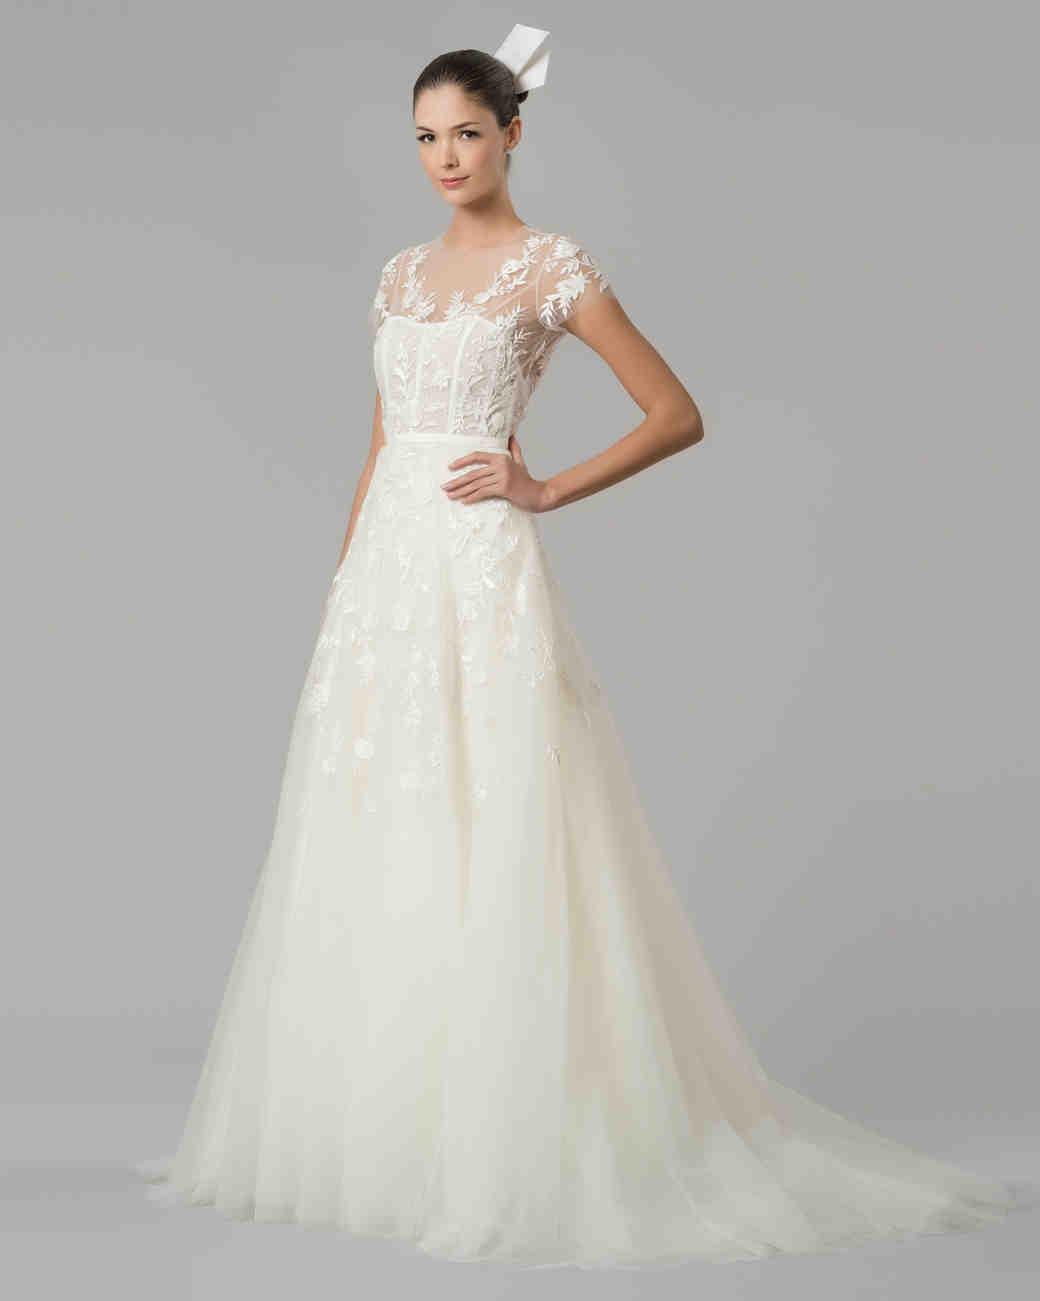 Carolina Herrera Fall 2015 Bridal Collection | Martha Stewart Weddings